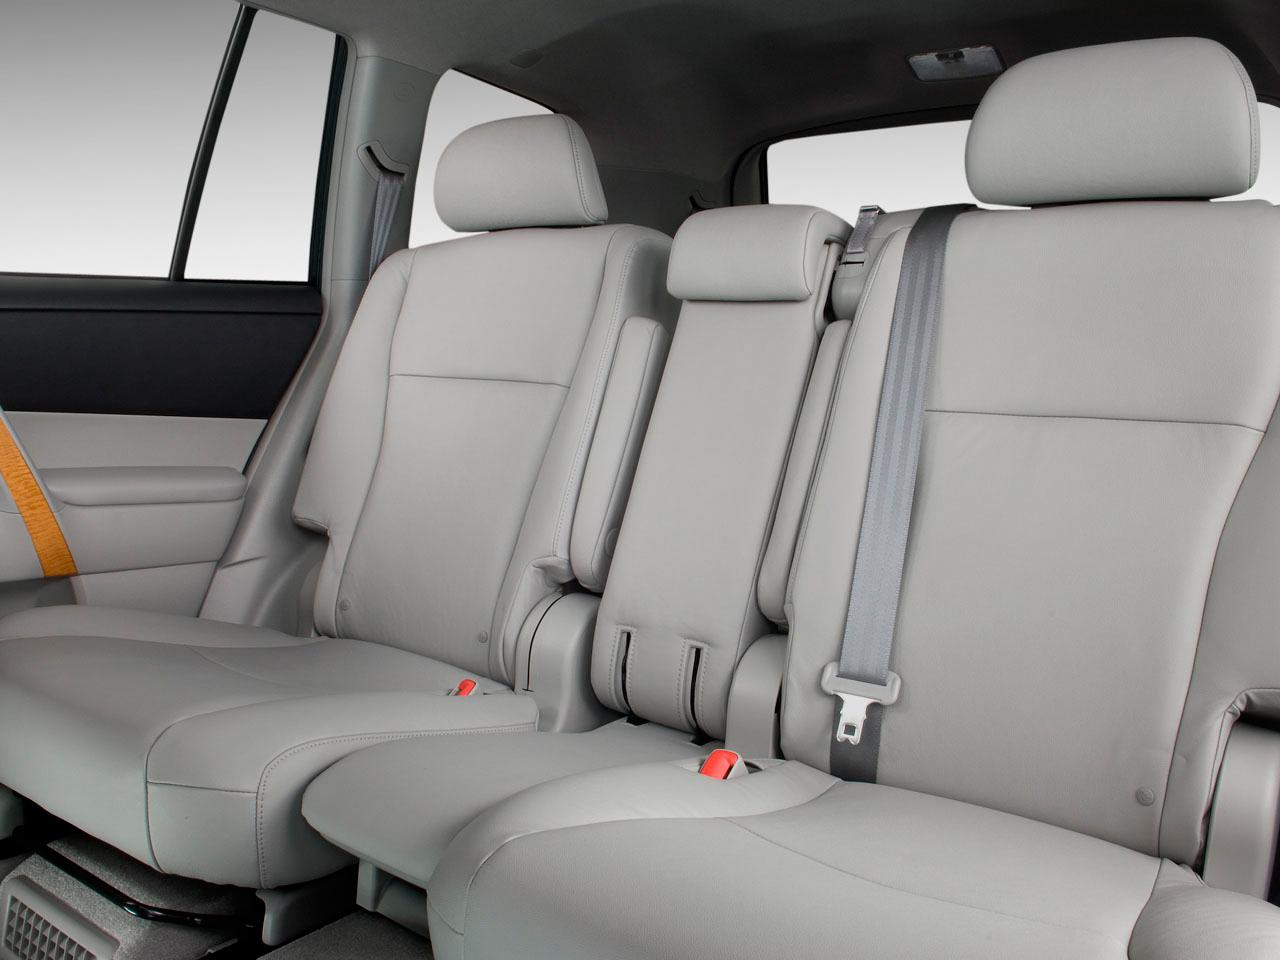 2015 Toyota Hydrogen Hybrid - Hydrogen Fuel Cell ...